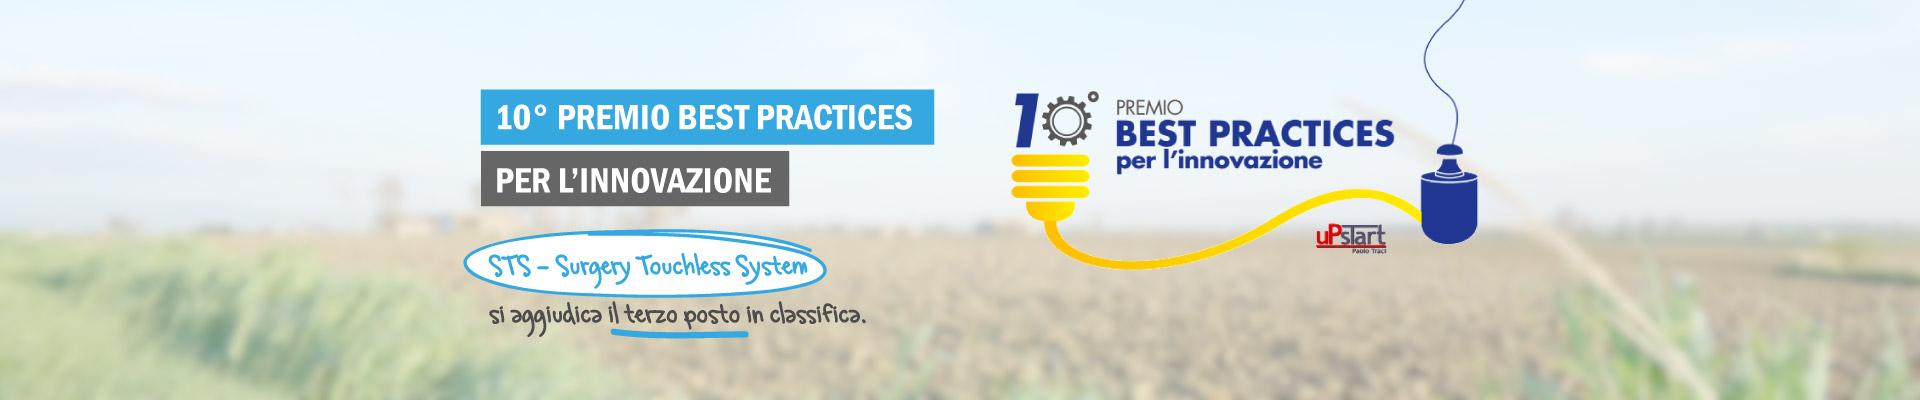 slide_premio-best-practice-innovazione